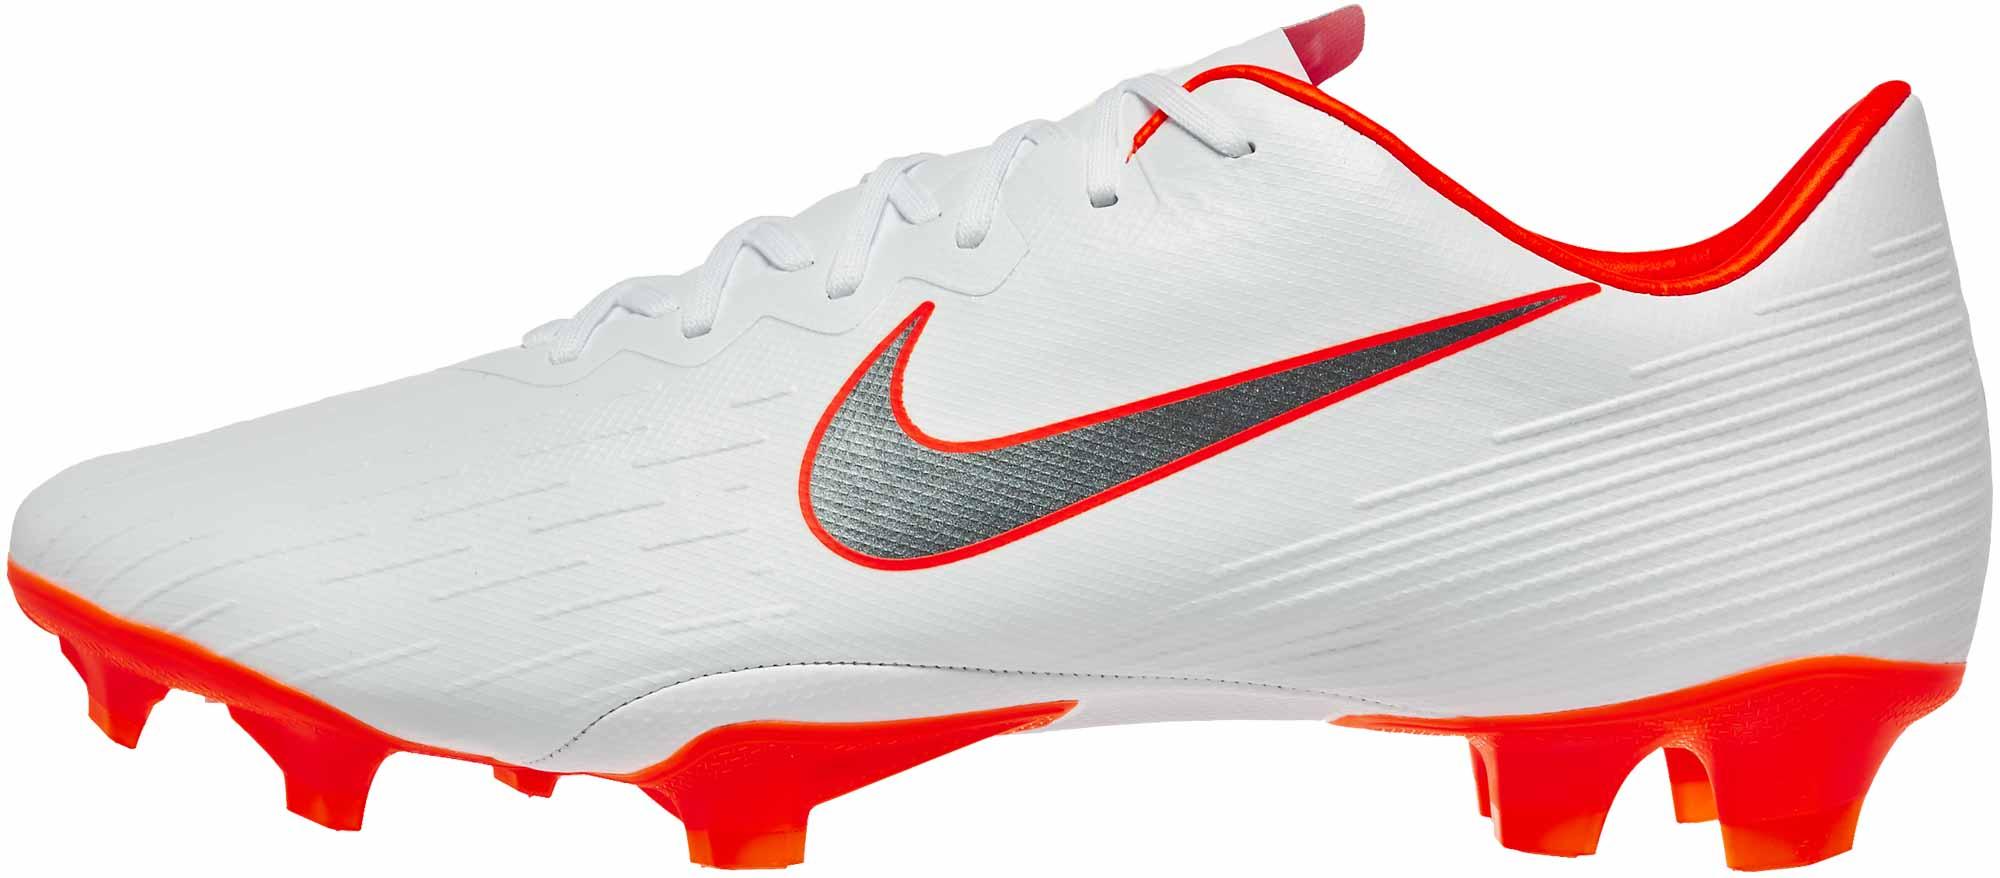 online retailer d2203 0606e Nike Mercurial Vapor 12 Pro FG – White Metallic Cool Grey Total Orange